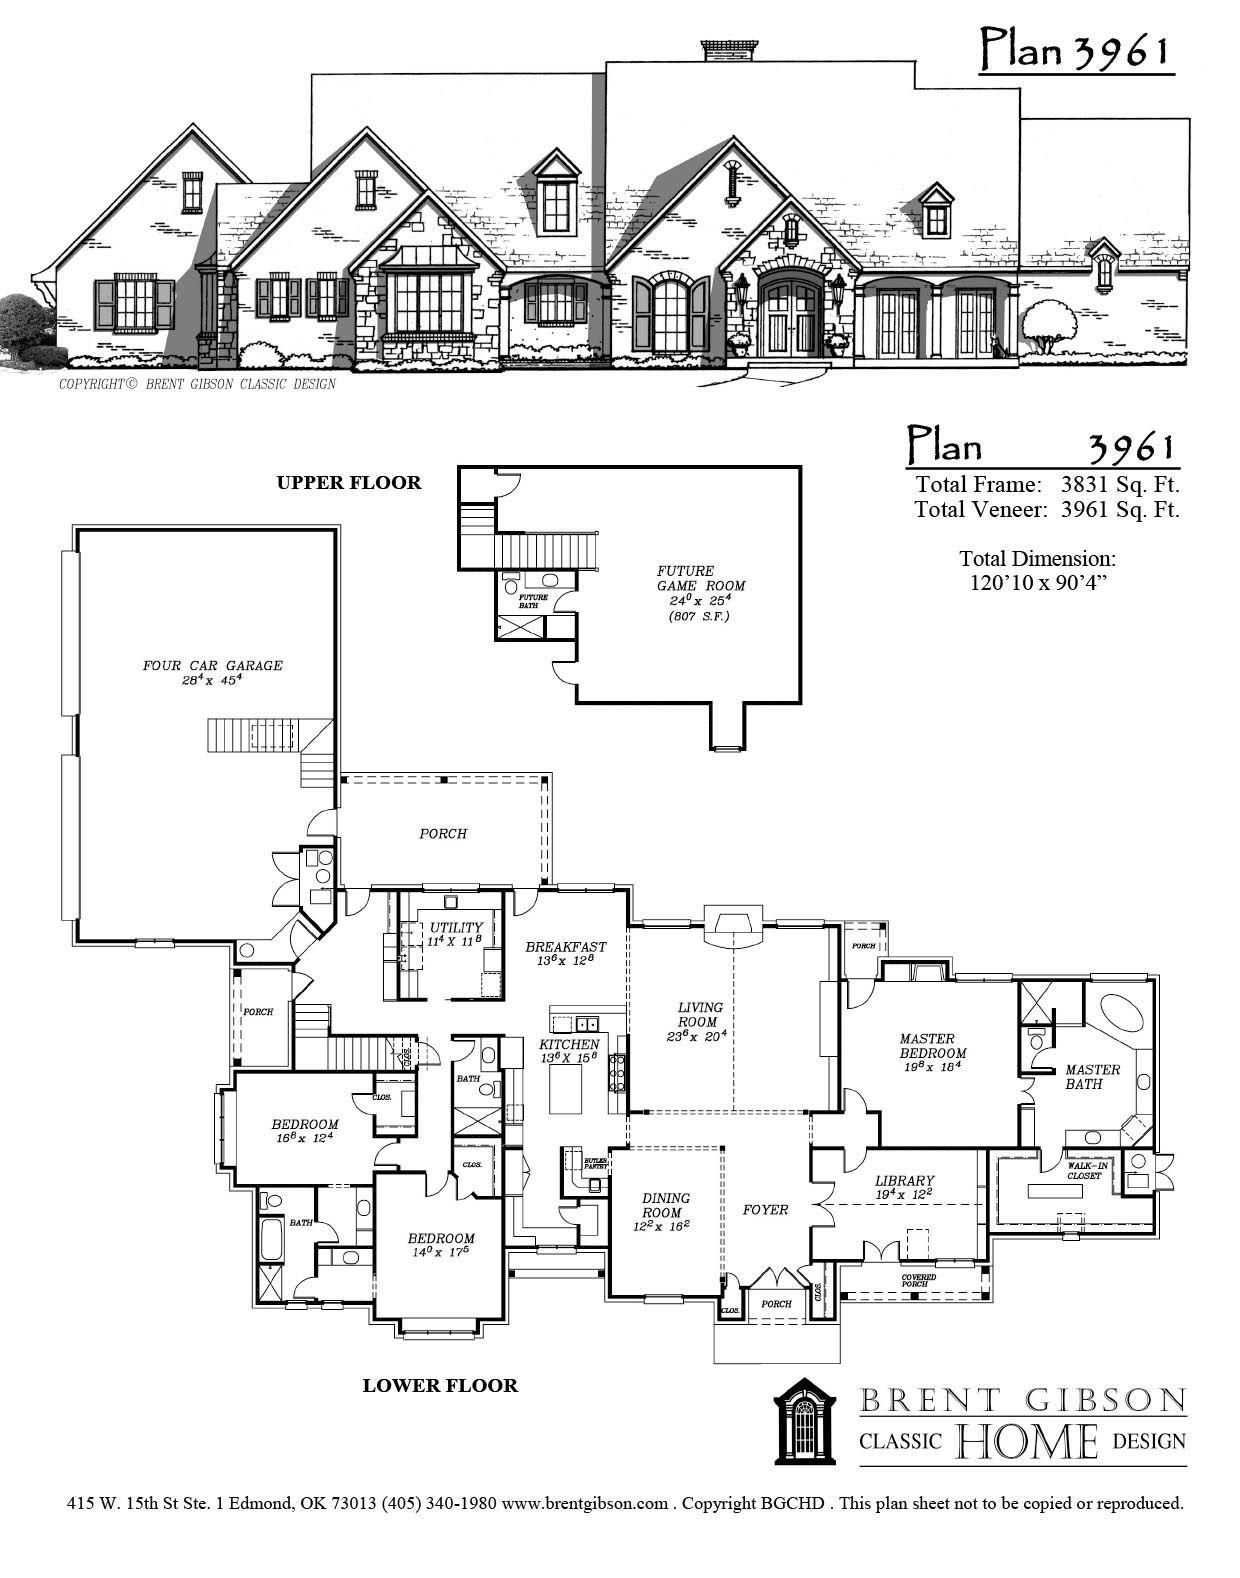 Plan 3961 Brent Gibson Three Bedroom House Plan House Plans Bedroom House Plans